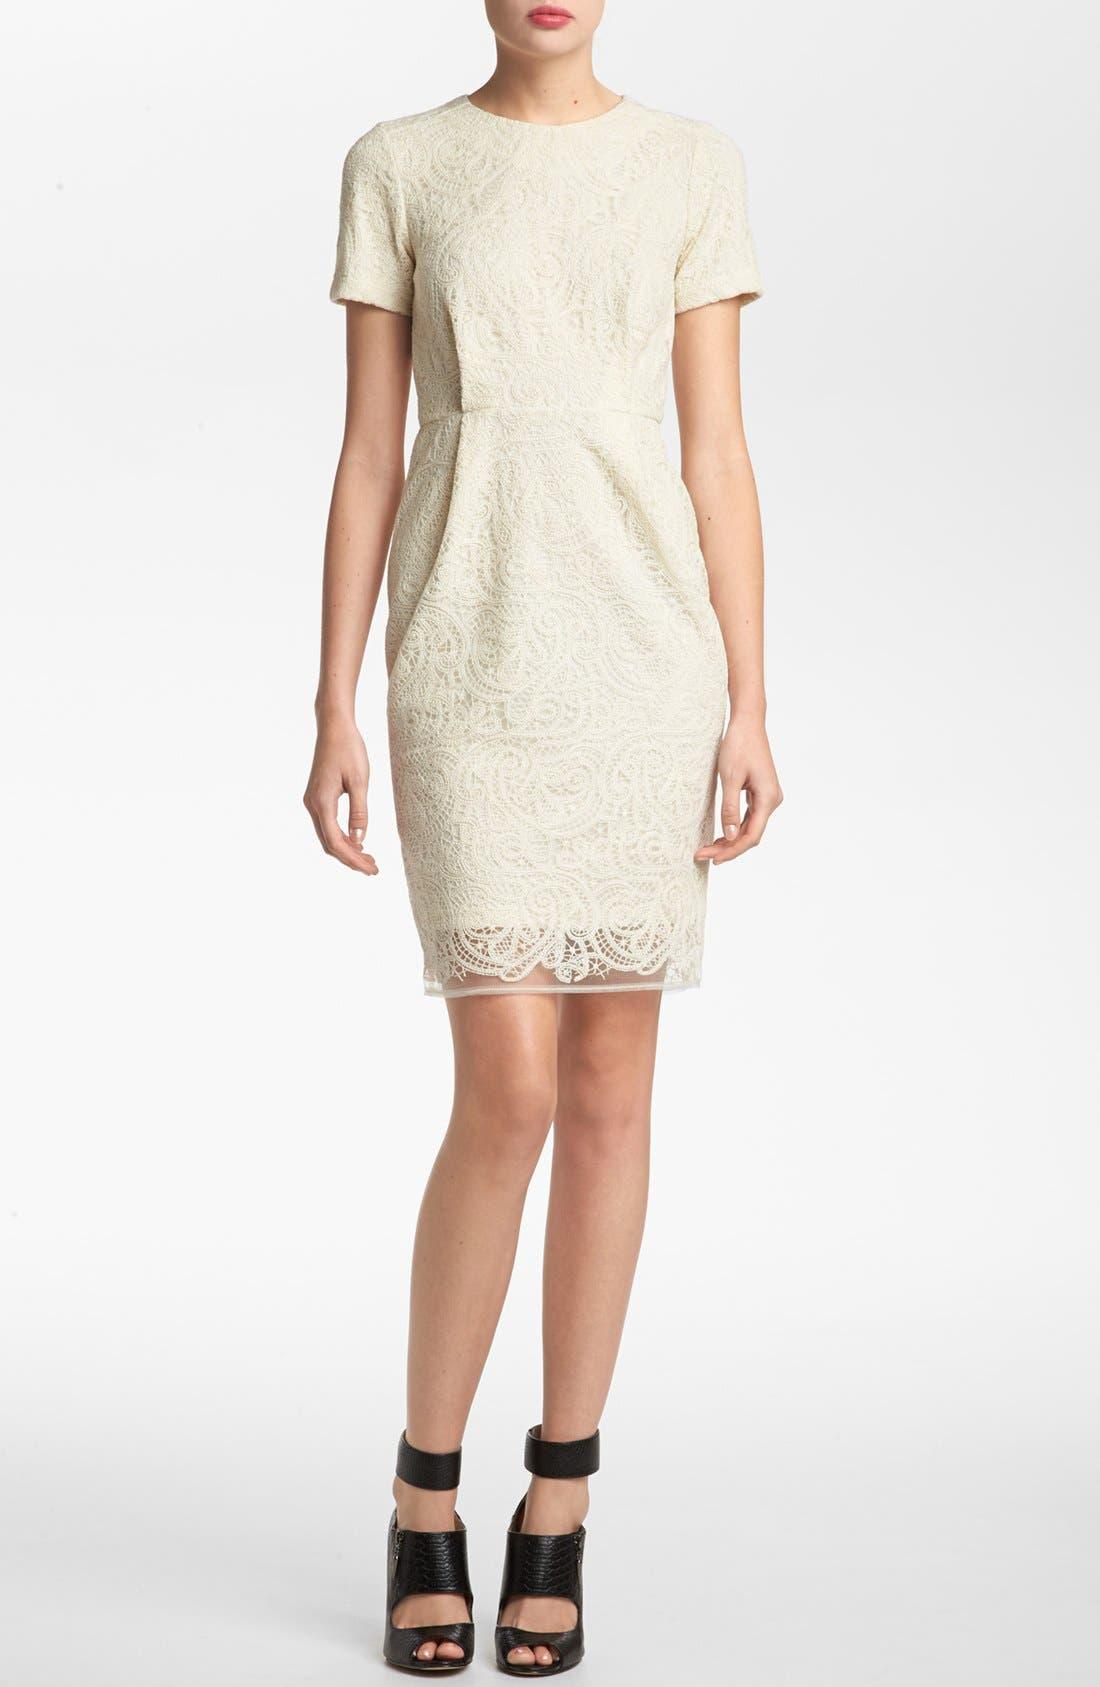 Alternate Image 1 Selected - Topshop 'Elfin' Lace Sheath Dress